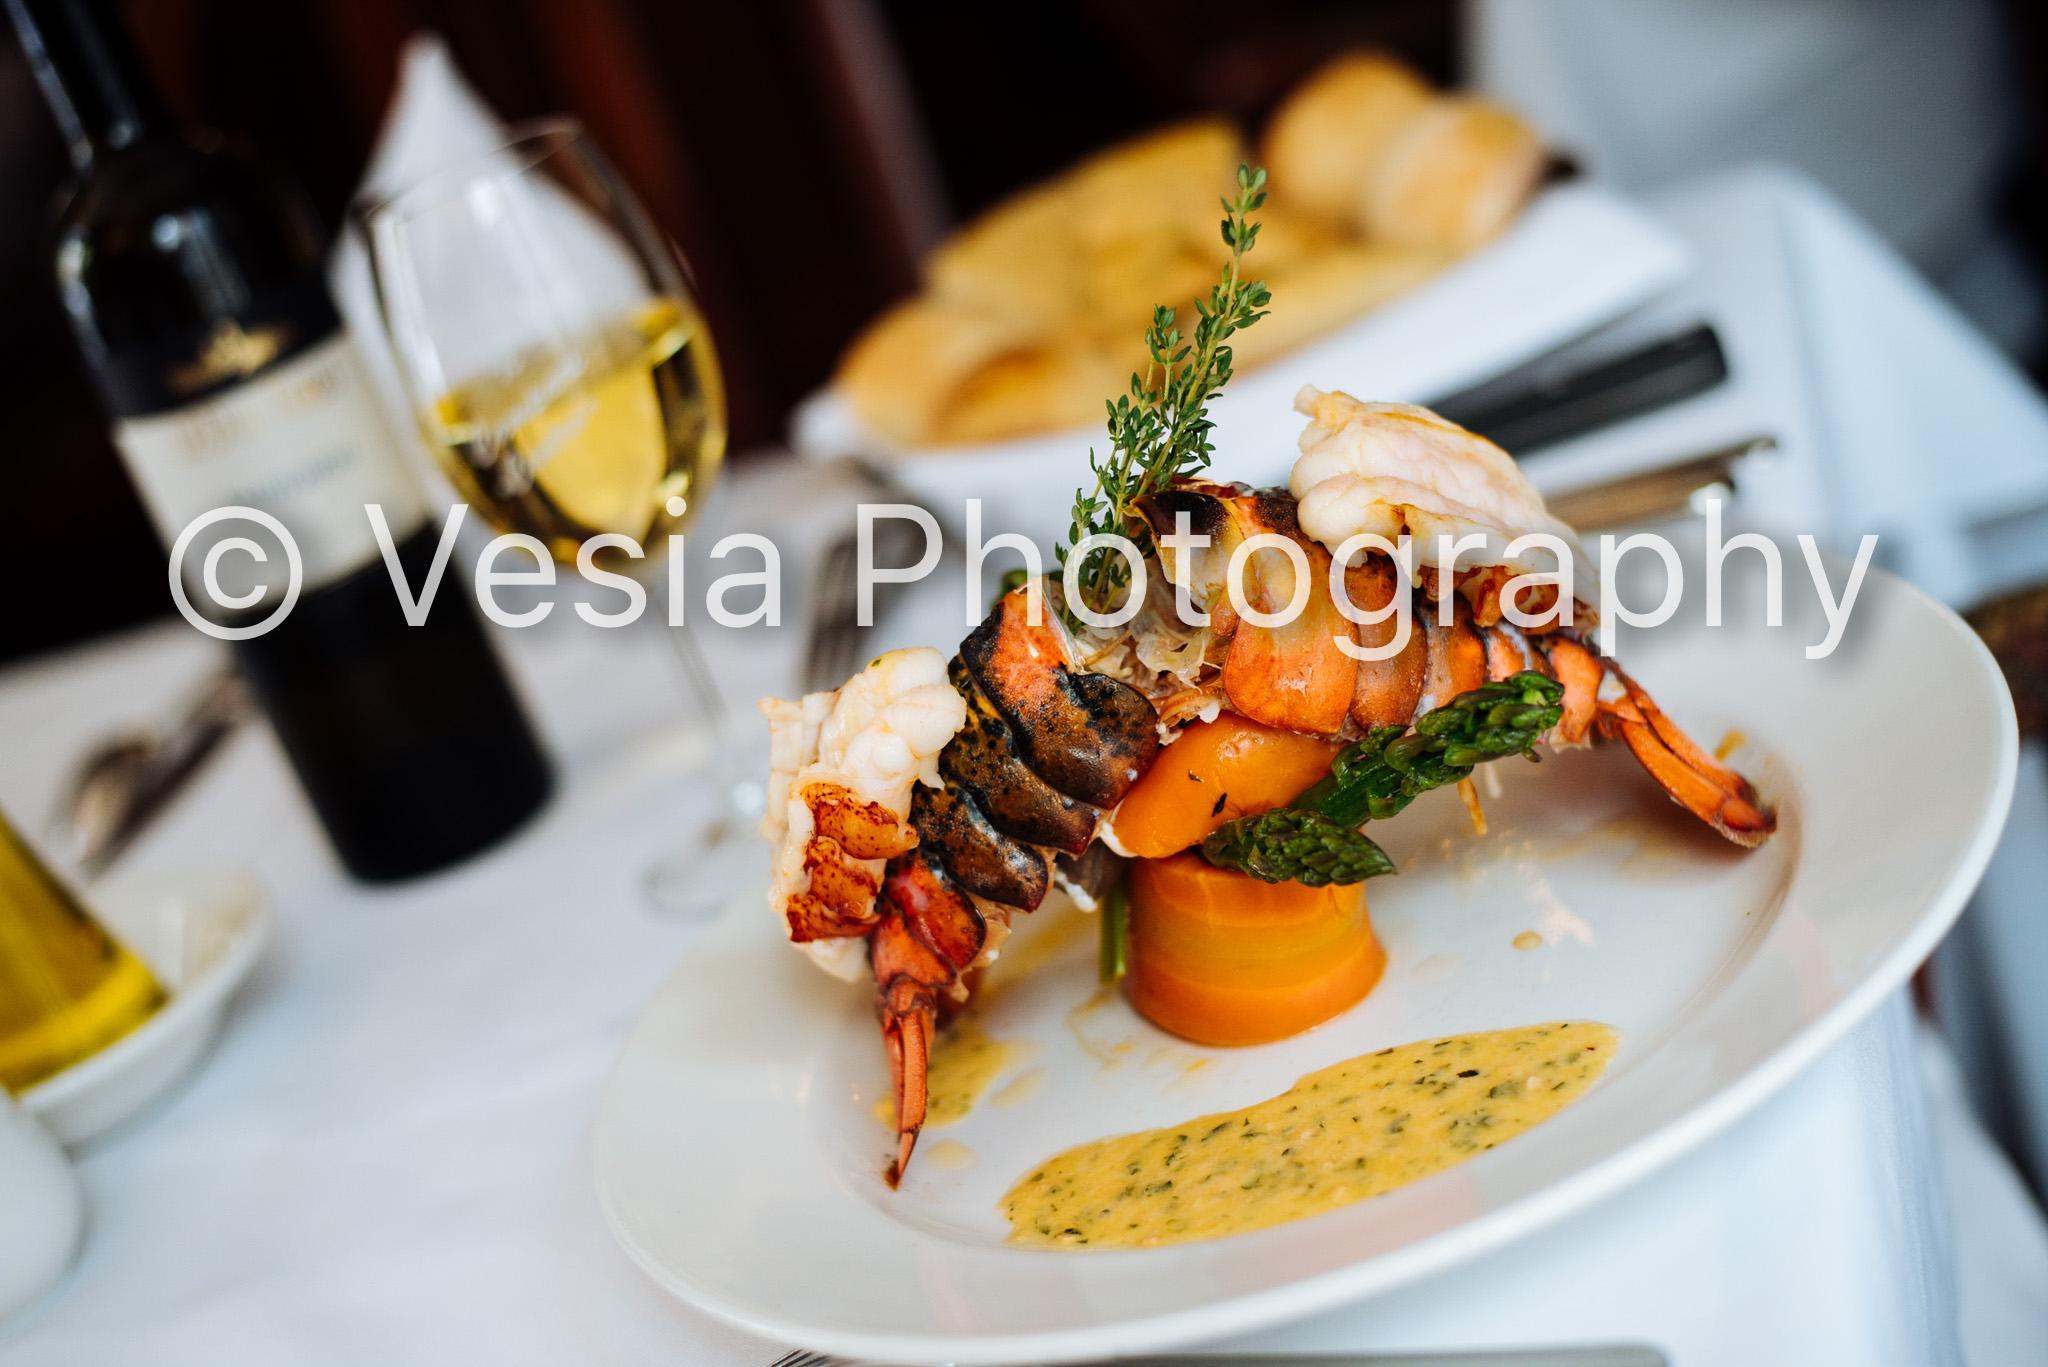 Campari_Centro_Food_Proofs-14.jpg